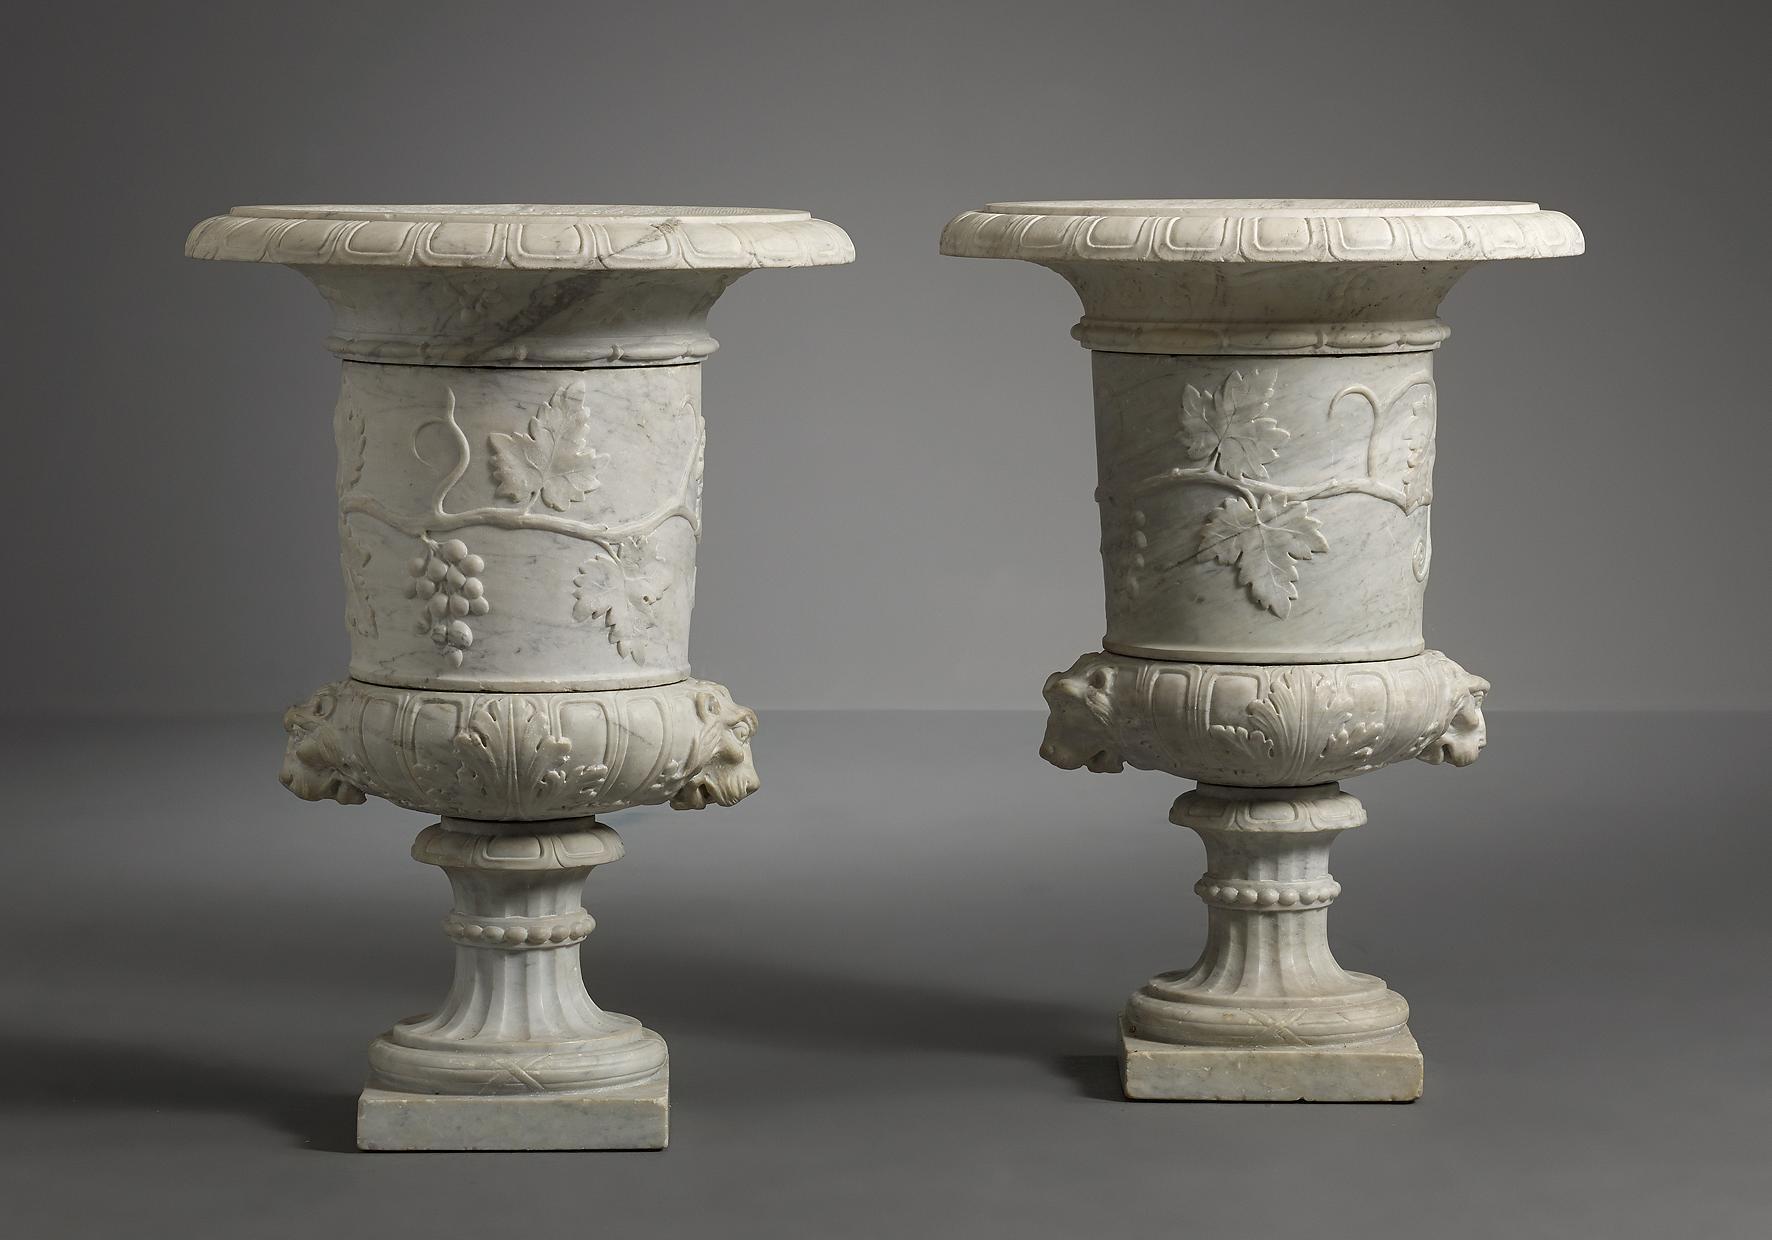 Paar italiaanse wit marmeren vazen objets d 39 art kollenburg antiquairs oirschot - Moulure architectuur ...